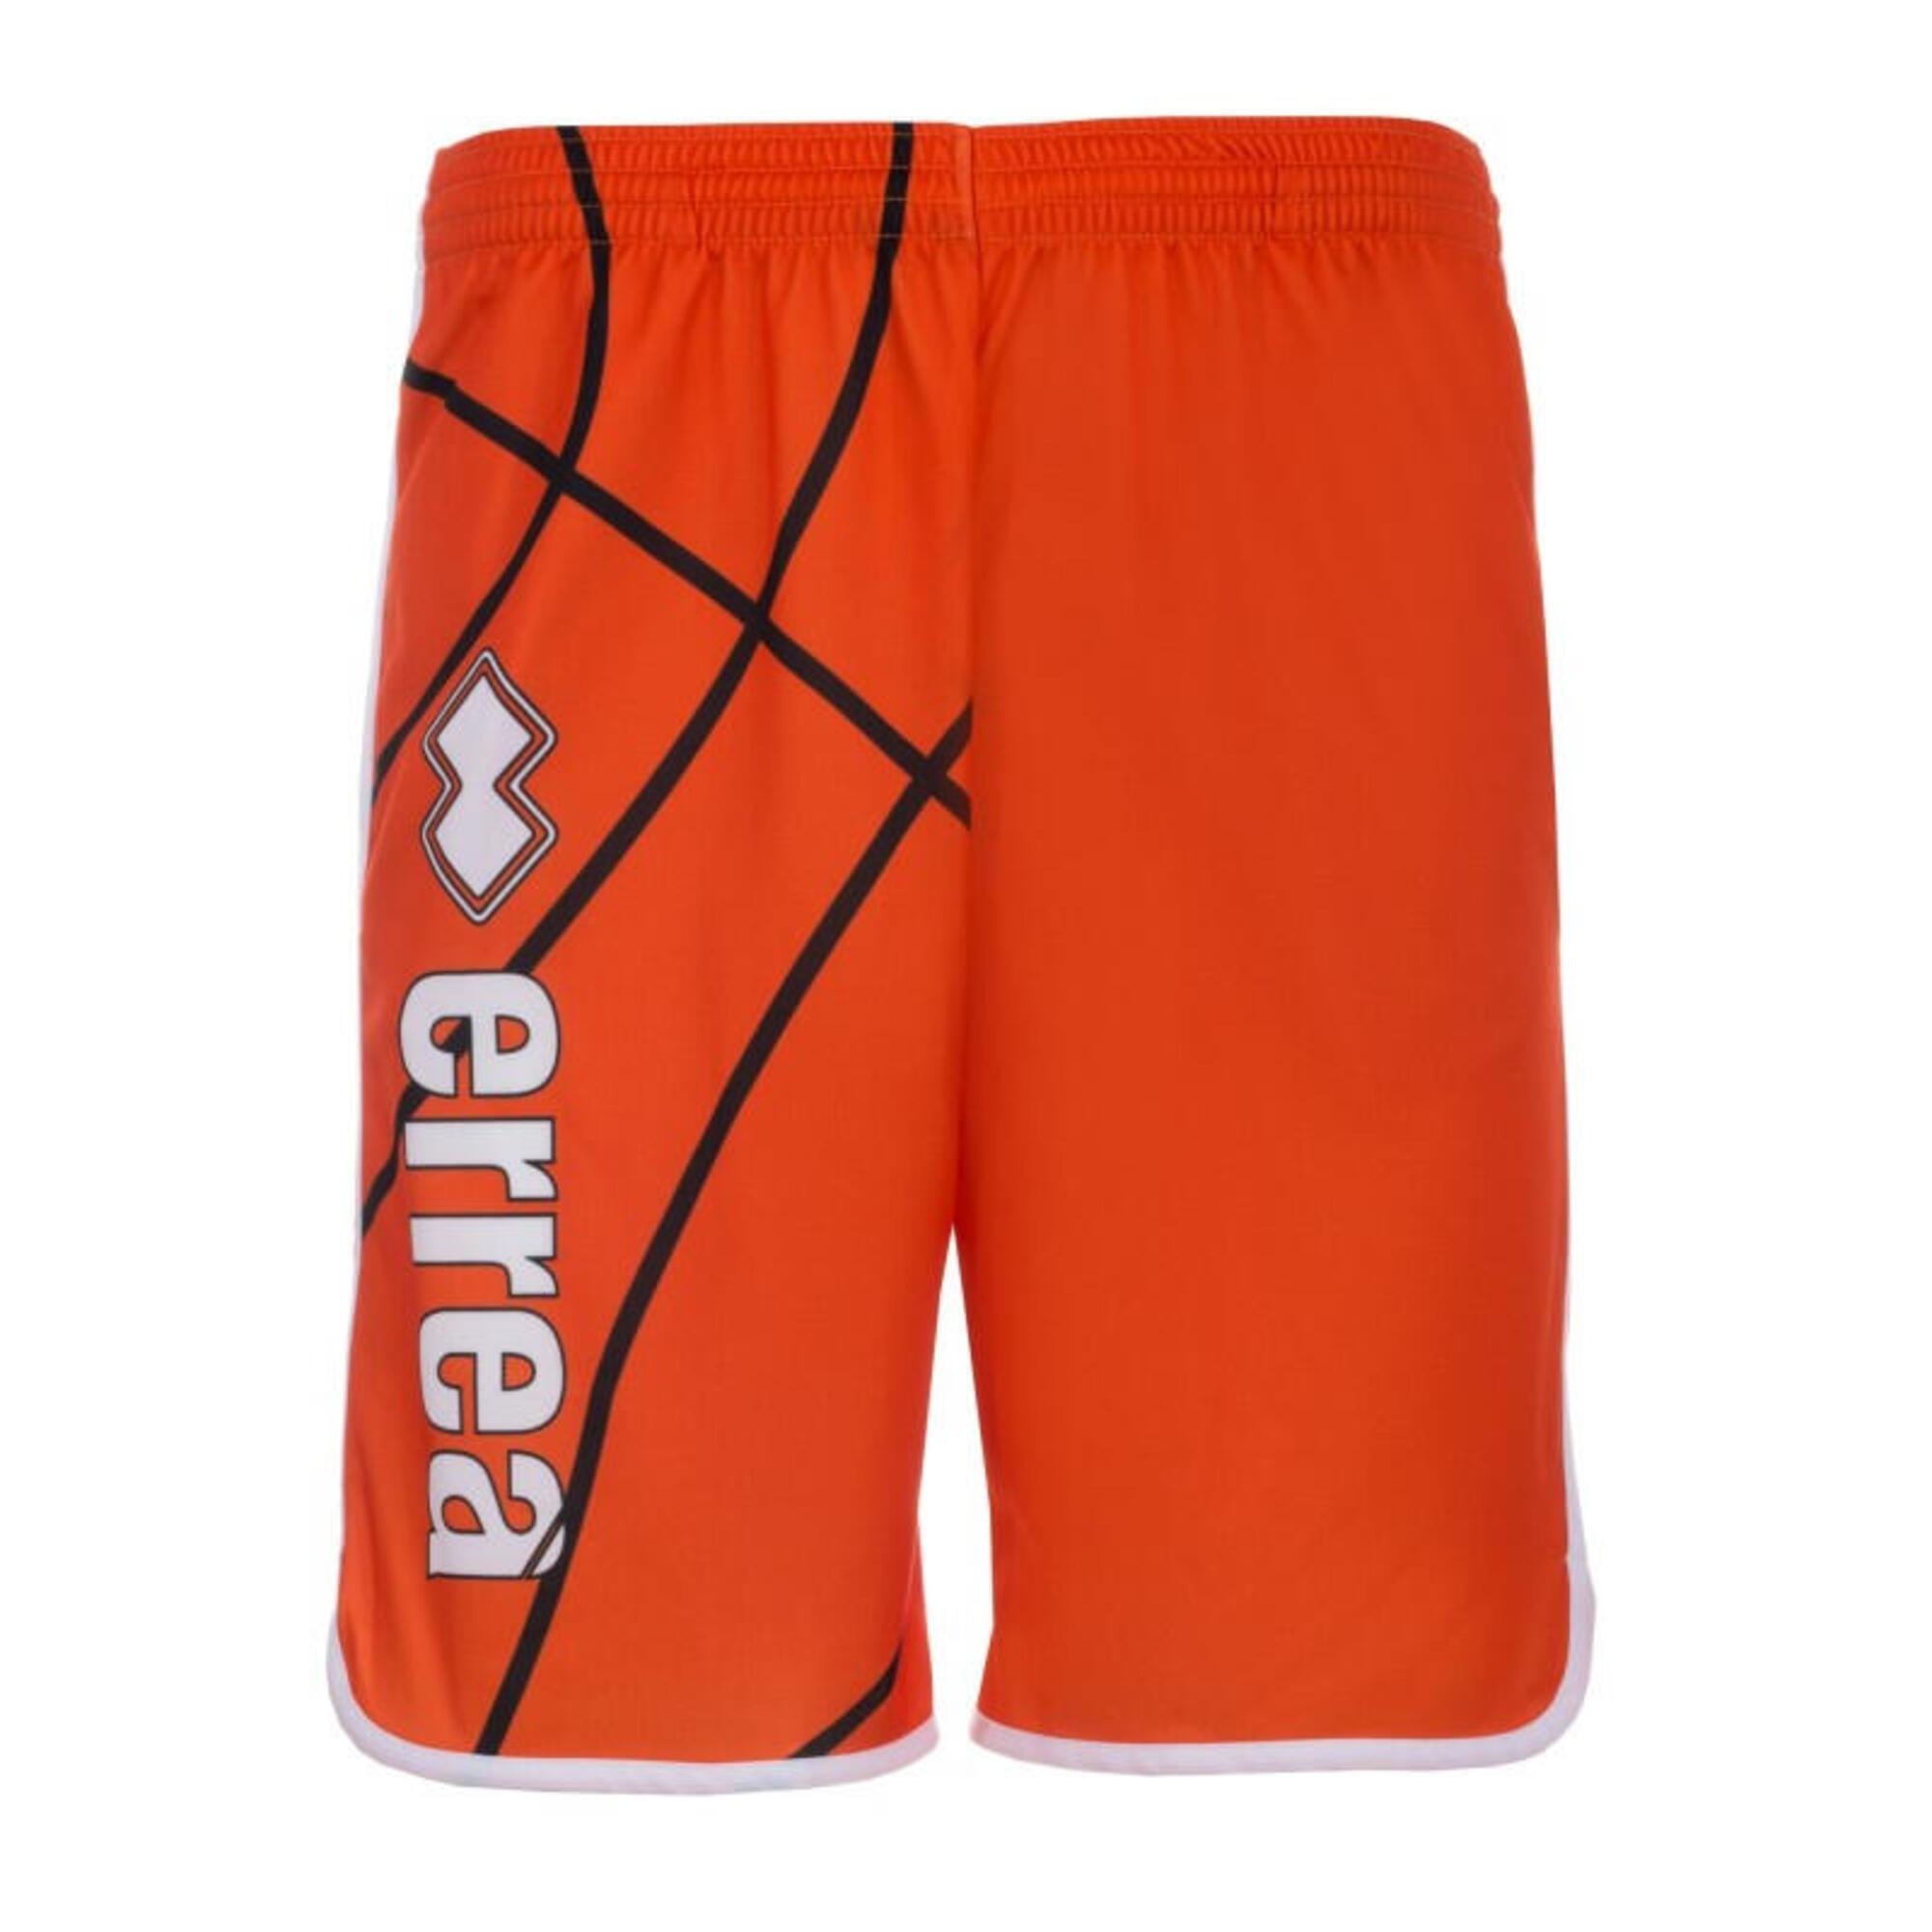 Short Errea essential sports